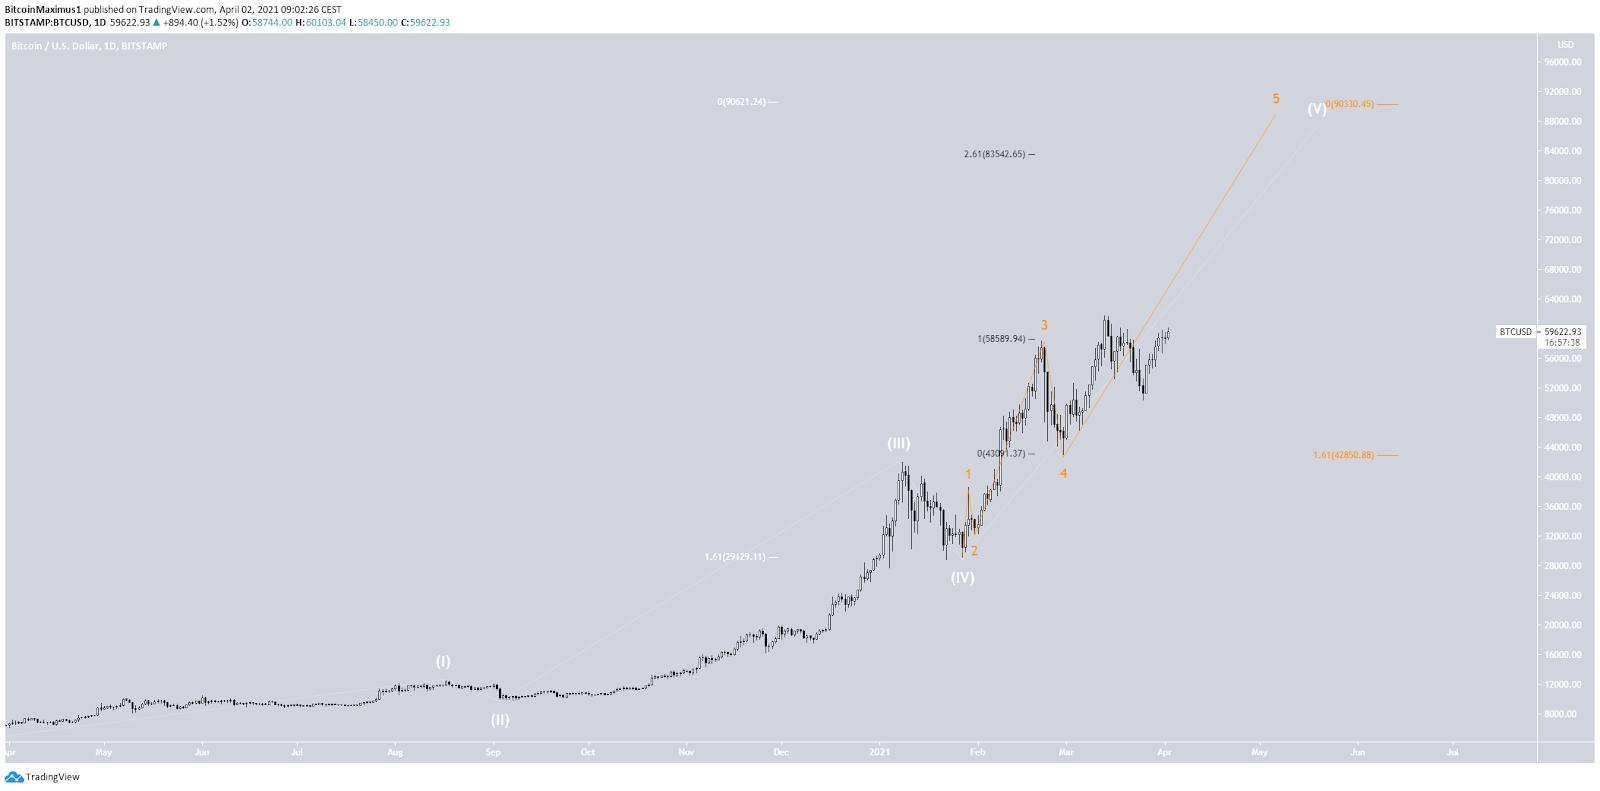 Bitcoin Kurs Wellenanalyse 02.04.2021